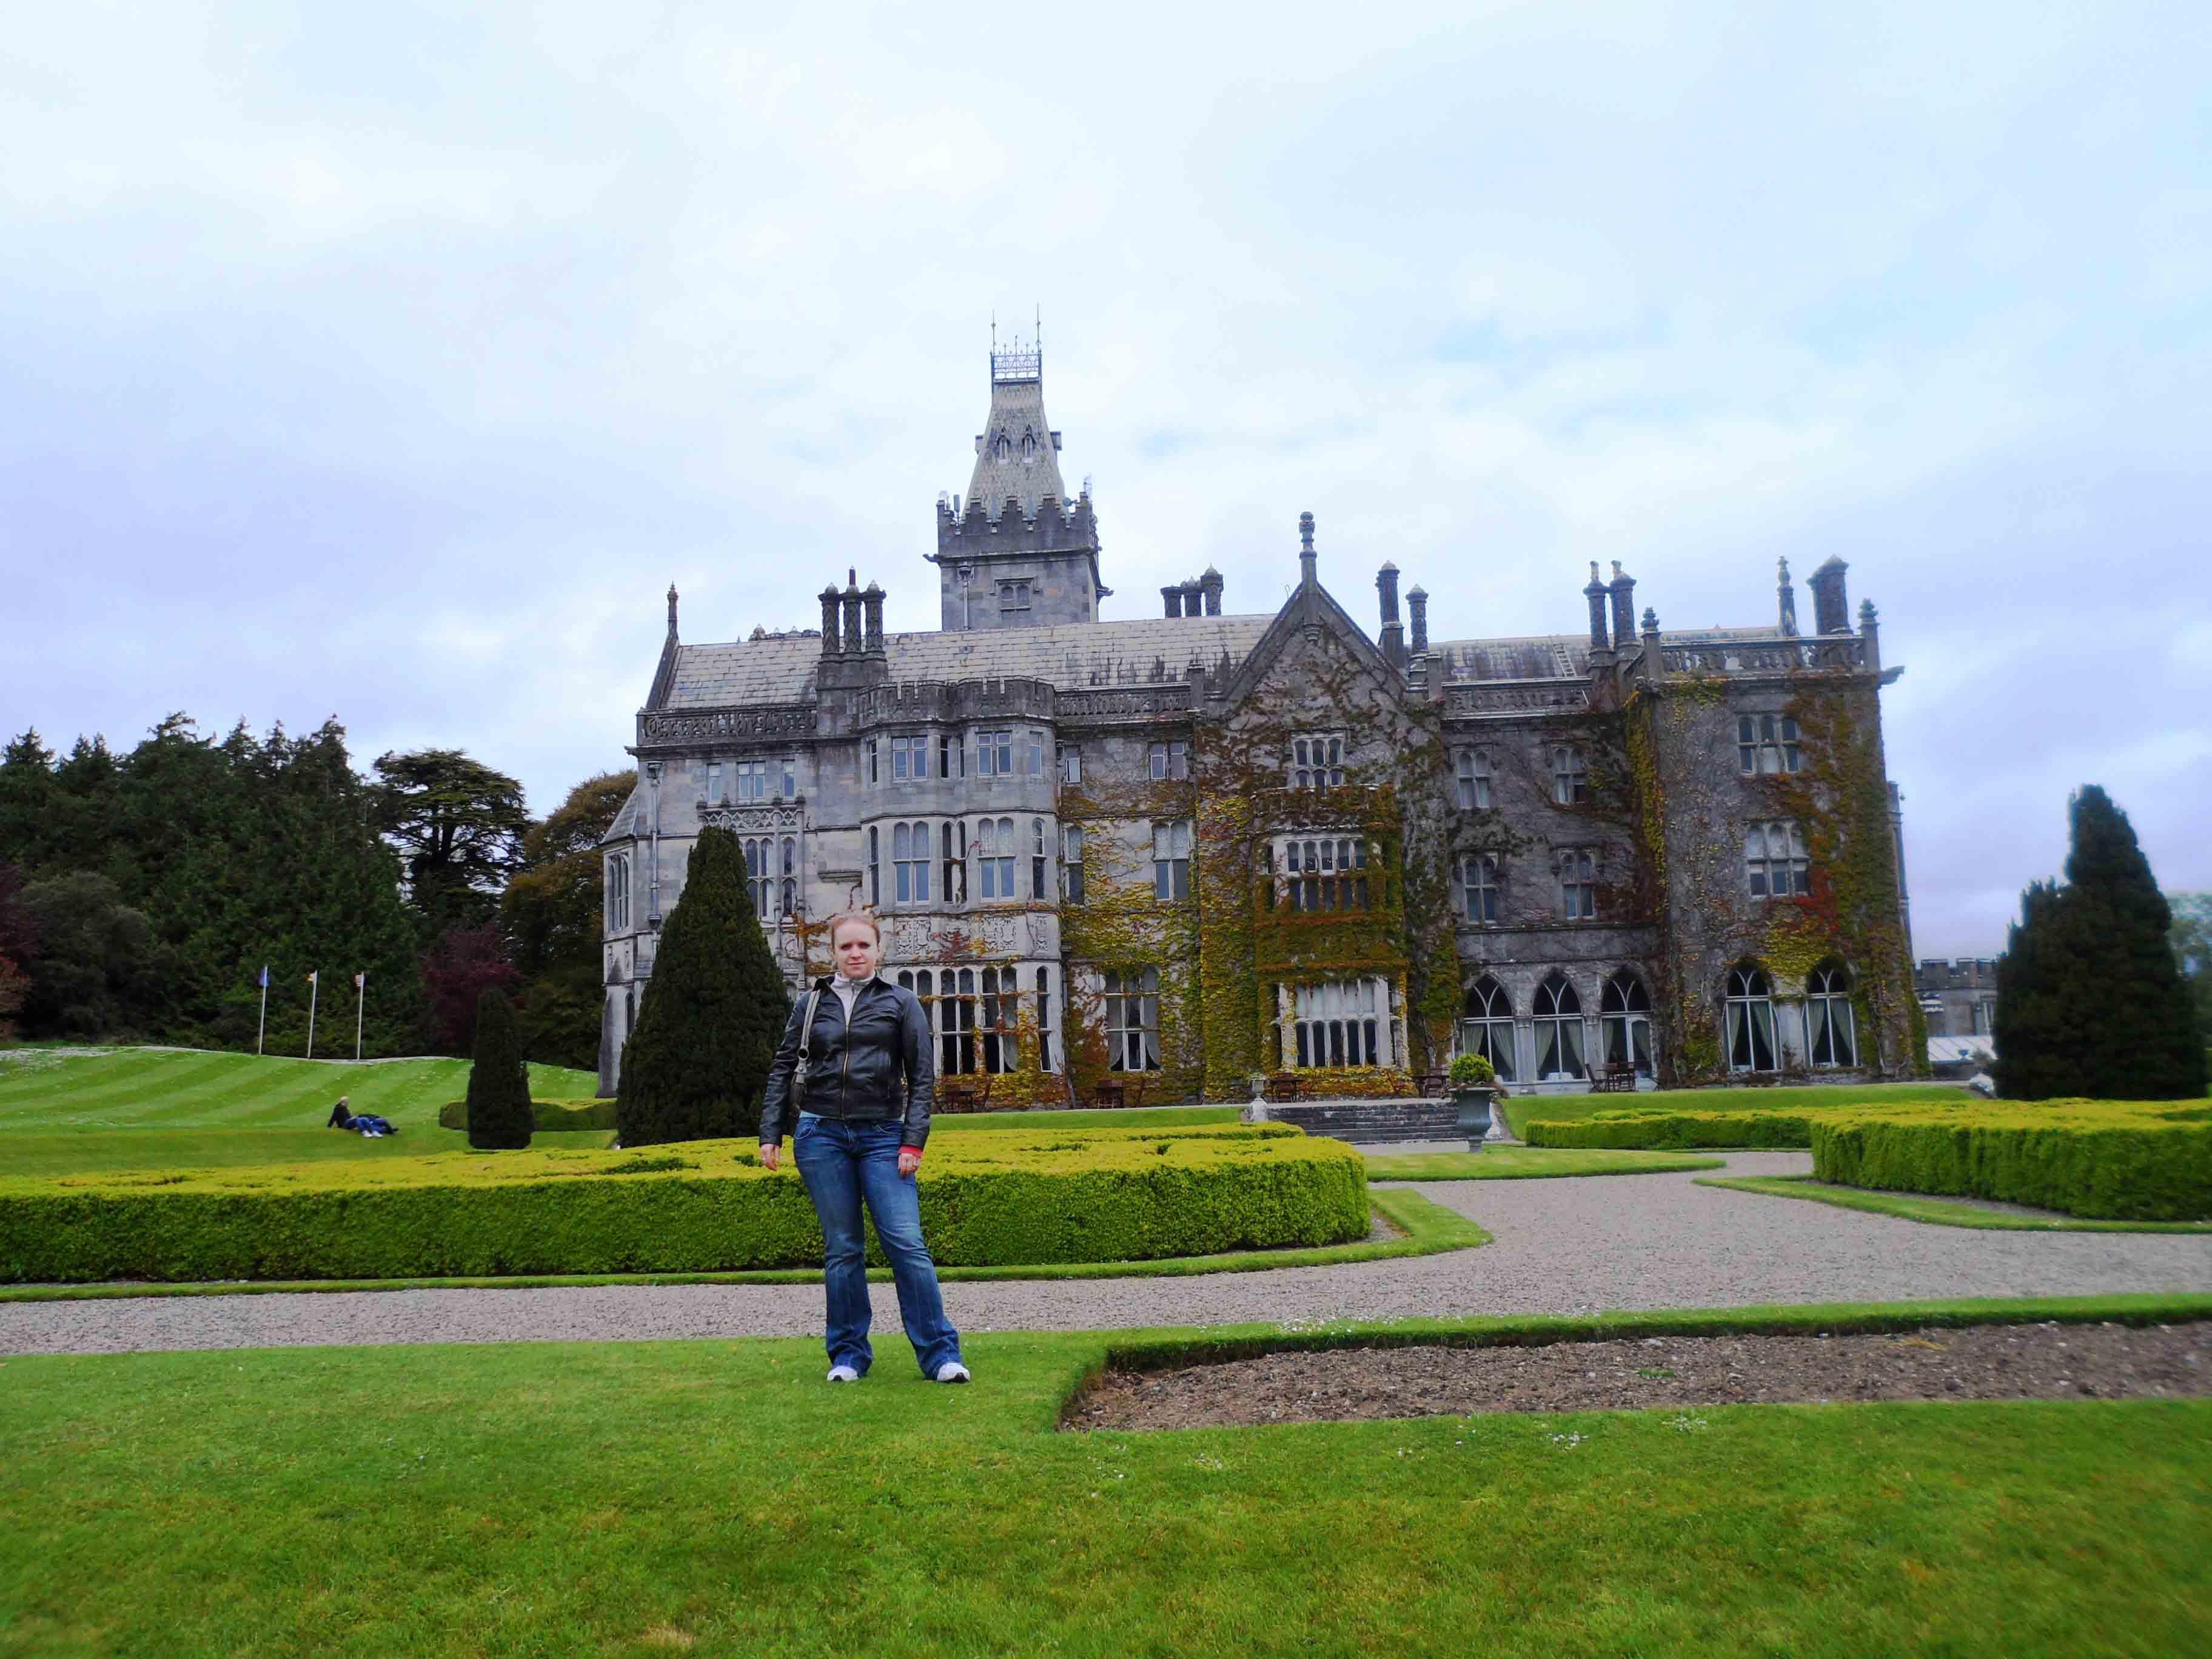 Adare Manor, Luxury Castle Hotel in Ireland